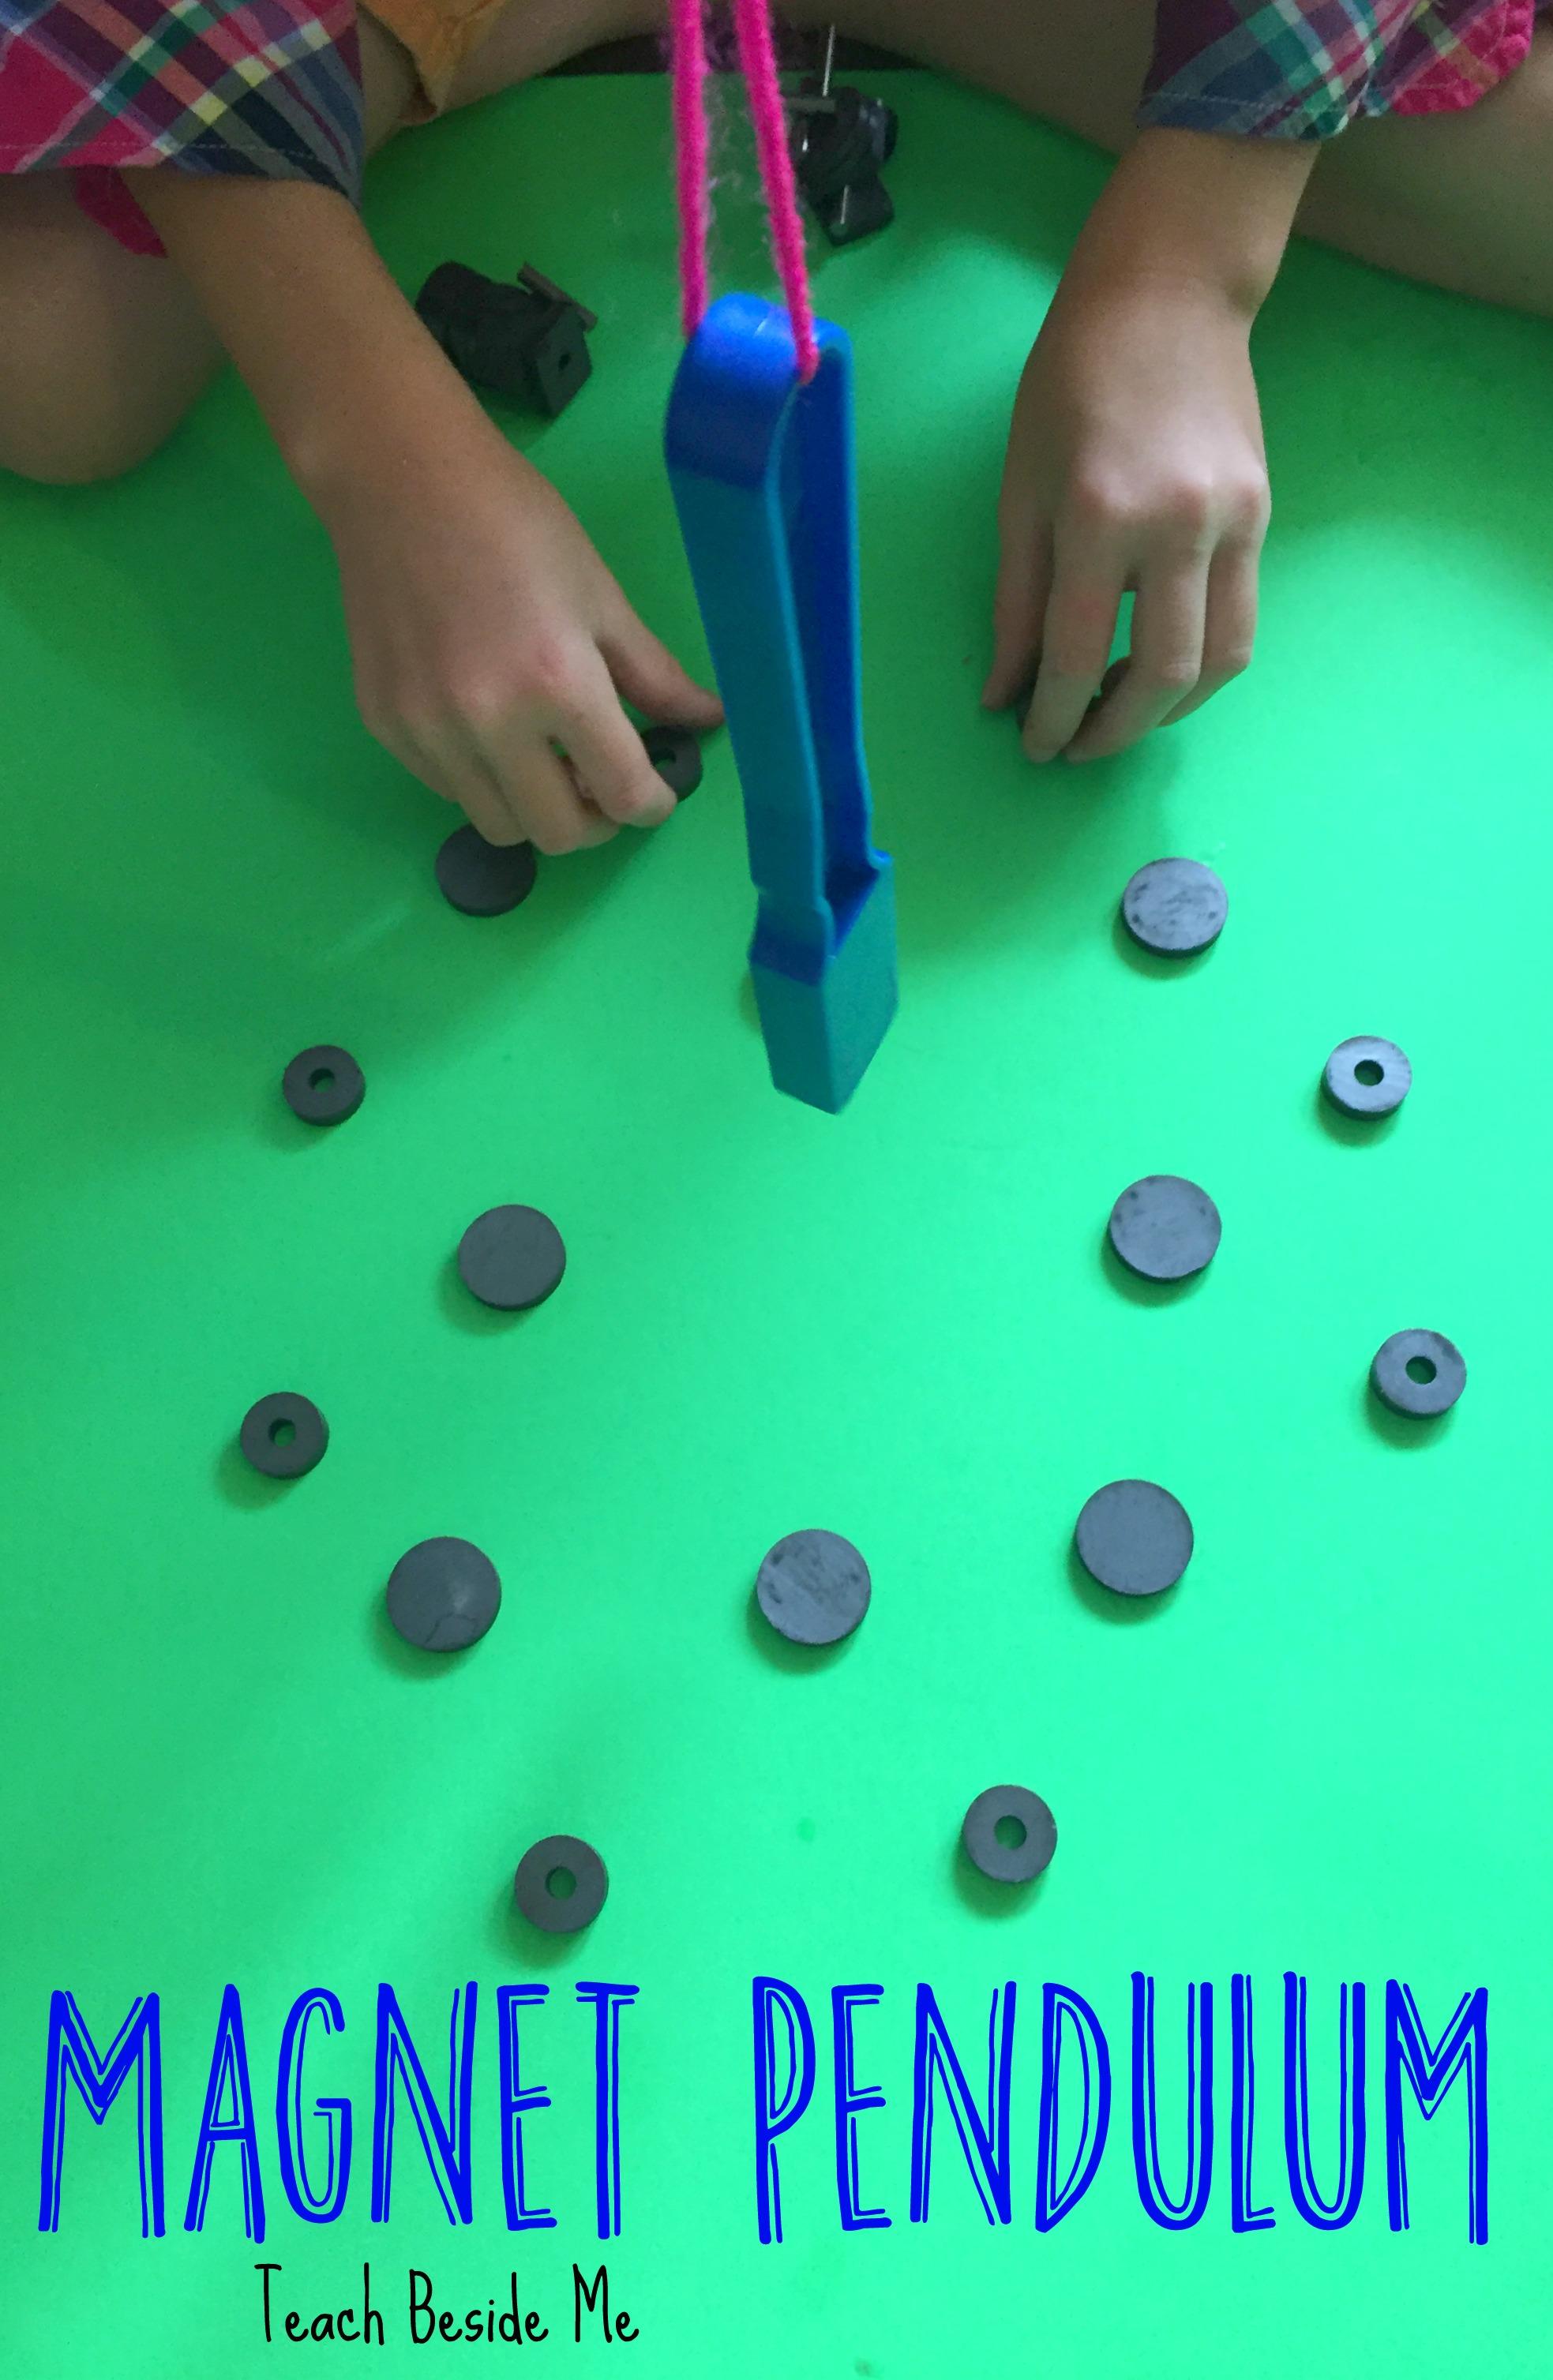 Magnet Pendulum Teach Beside Me